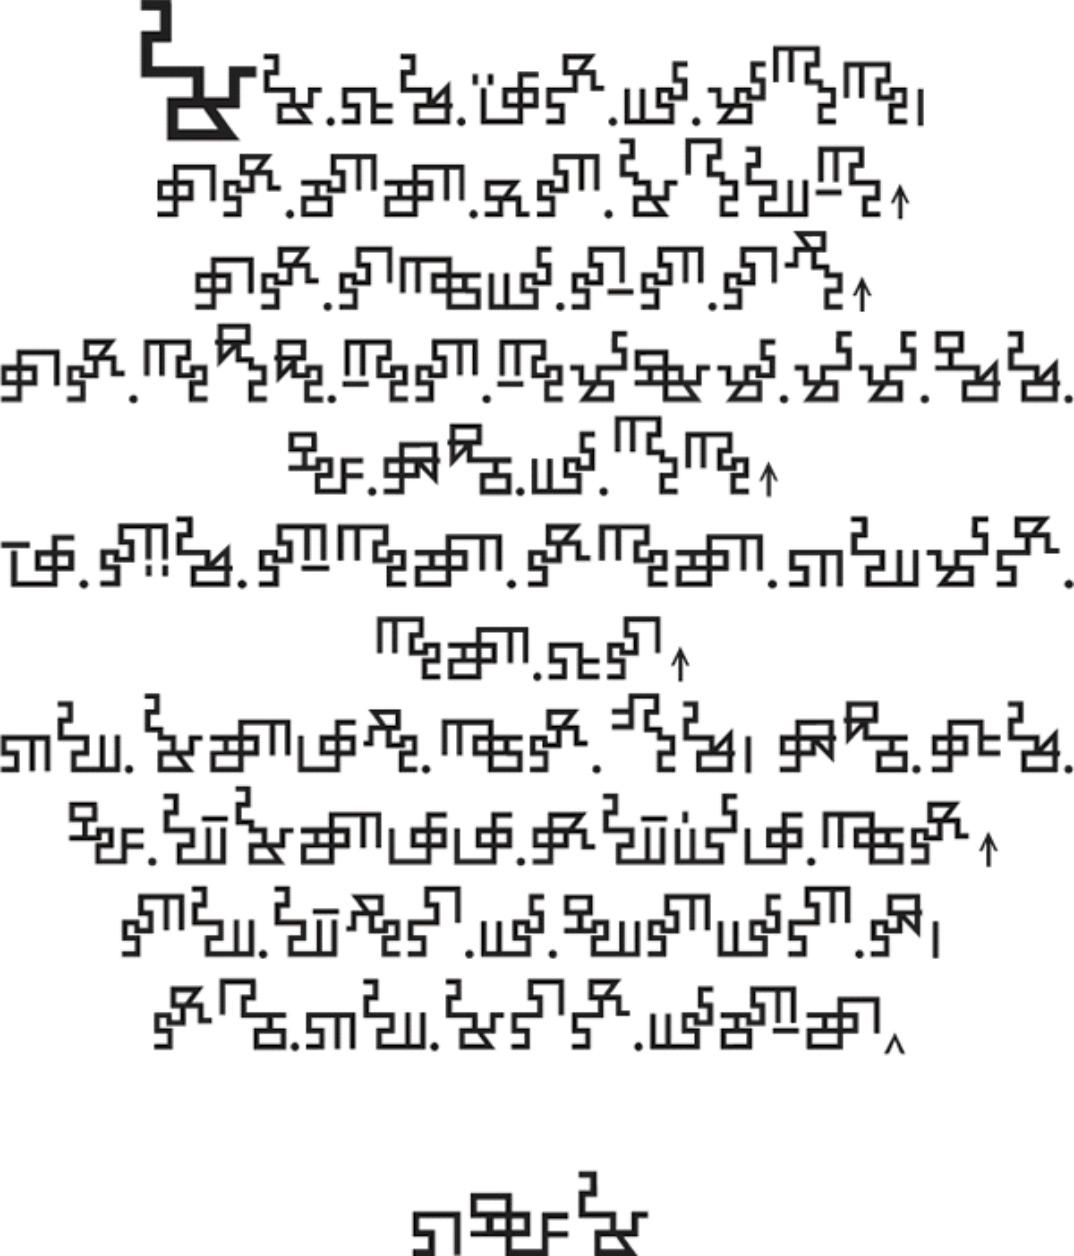 Mandombe-script-example.jpg